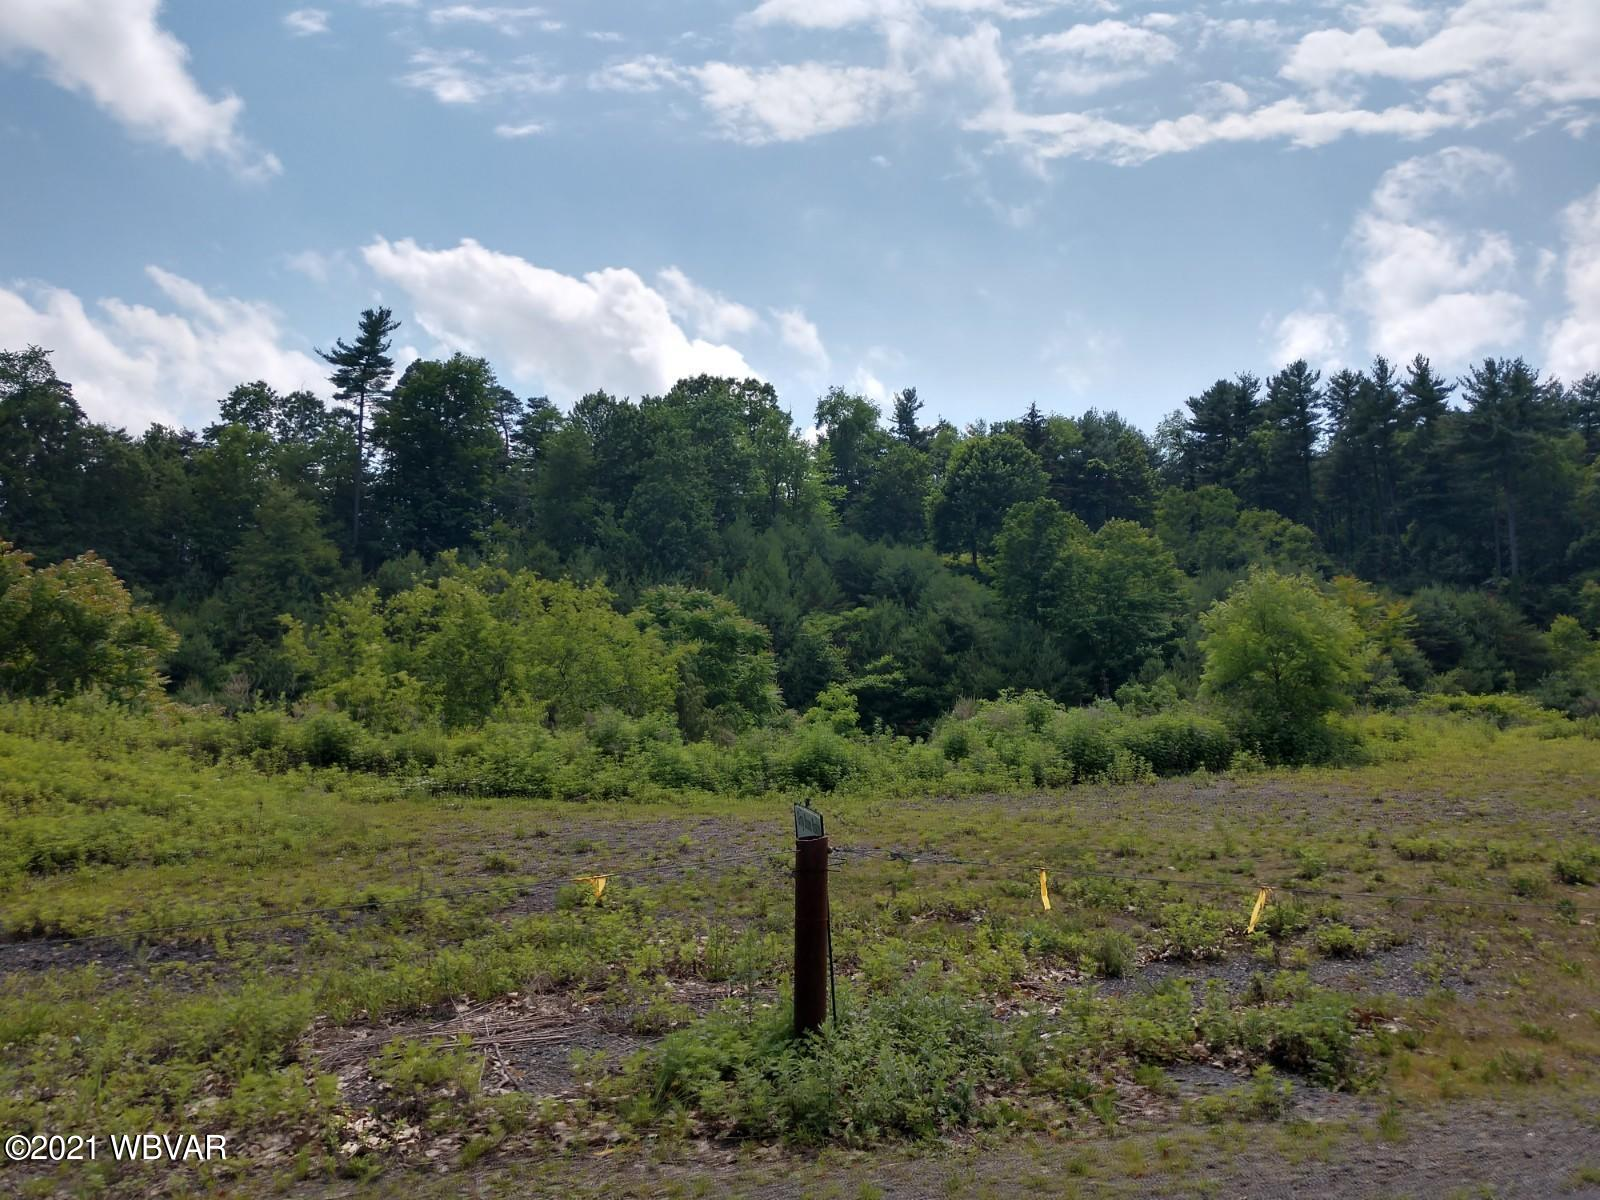 2360 WHEATLAND AVENUE, Williamsport, PA 17701, ,Land,For sale,WHEATLAND,WB-92793